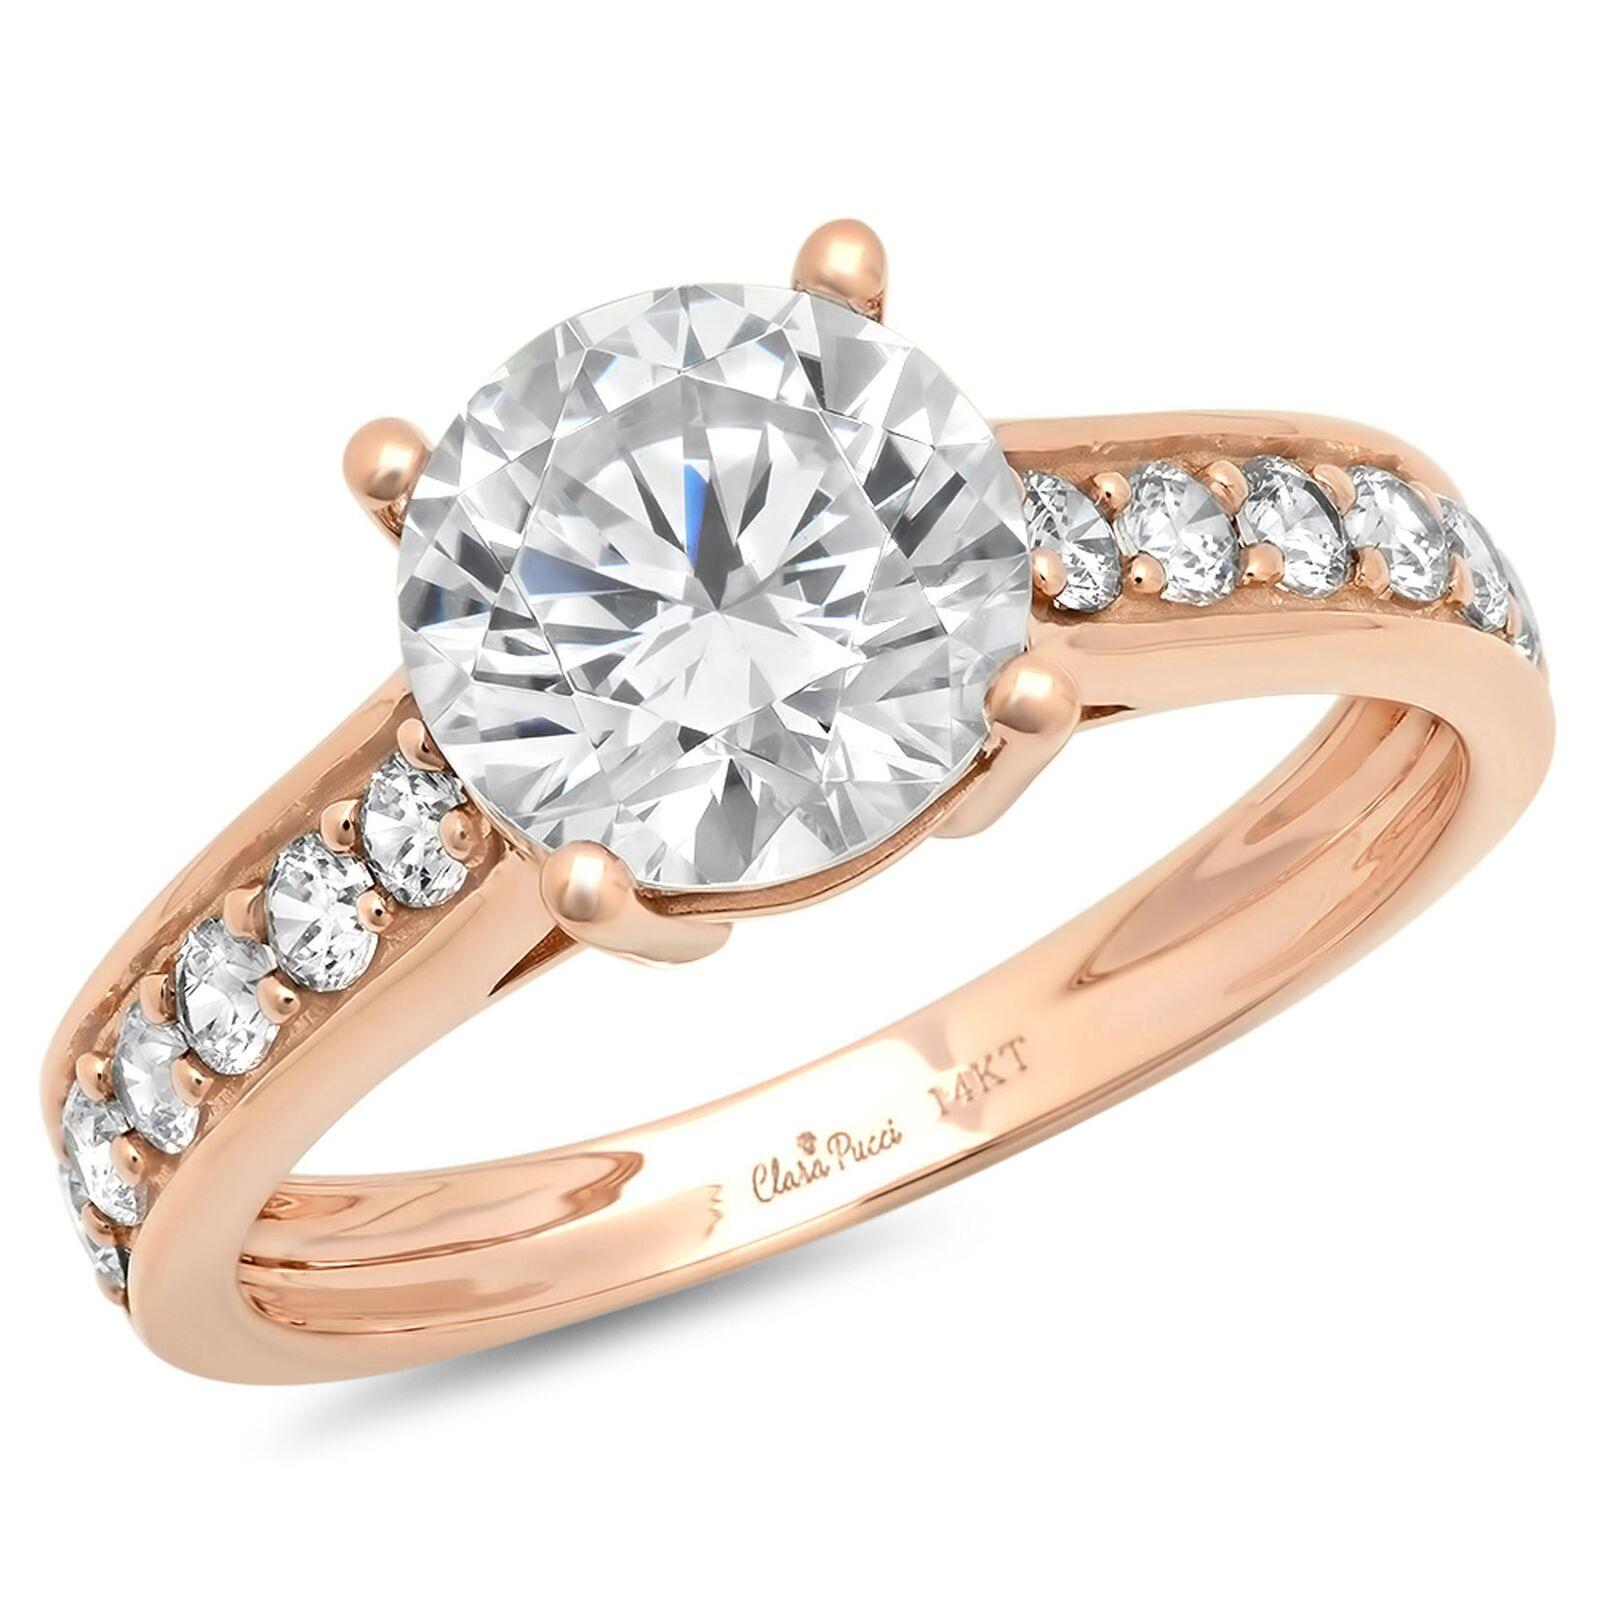 2.45ct Round Cut Wedding Bridal Engagement Anniversary Gift Ring 14k pink gold